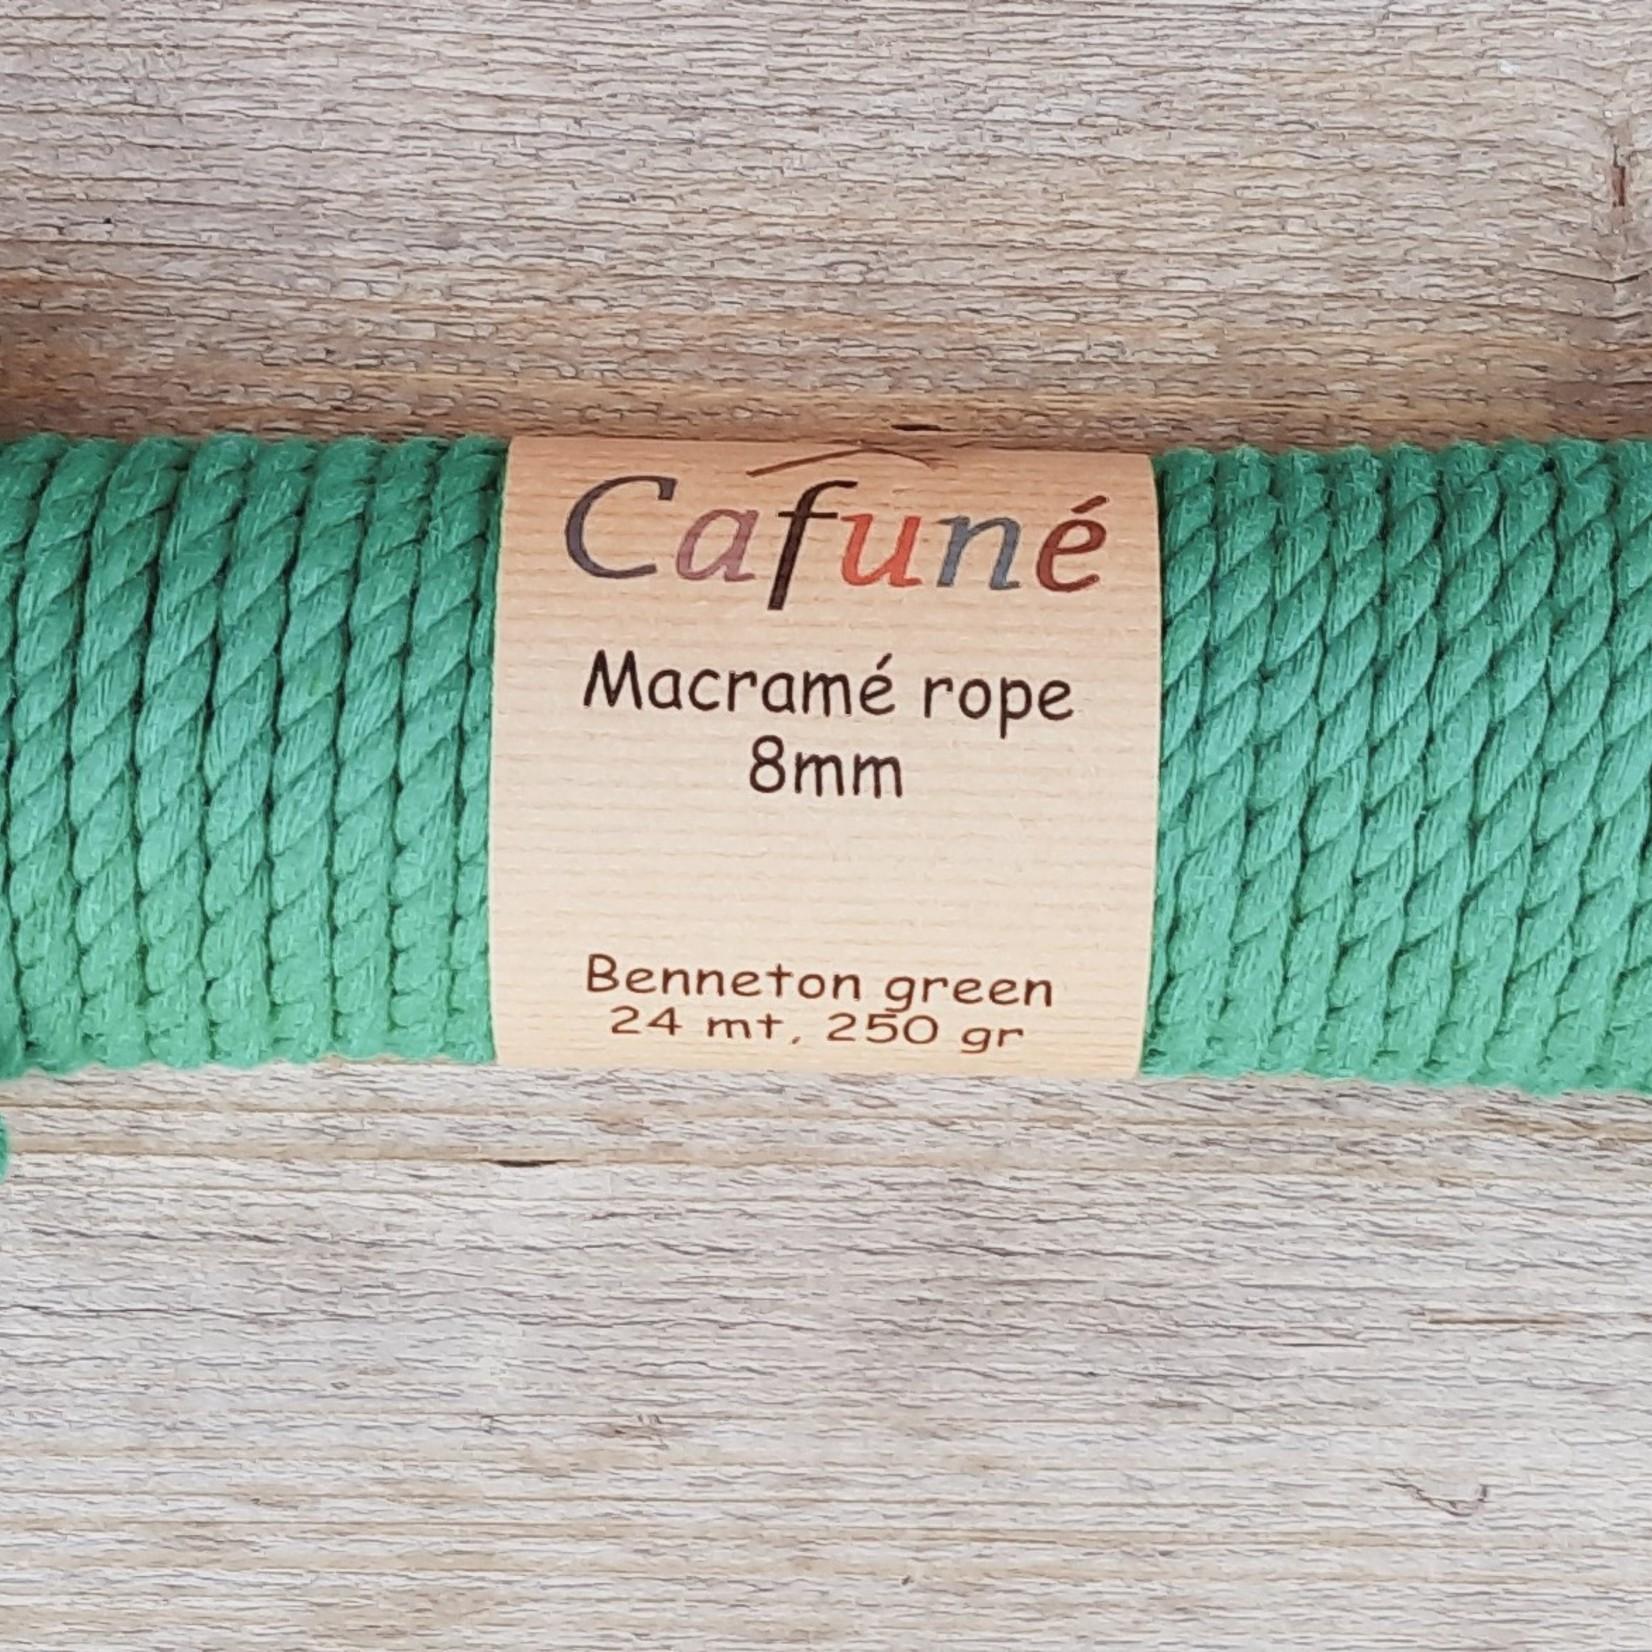 8mm Macrame touw Bennetongroen, double twisted